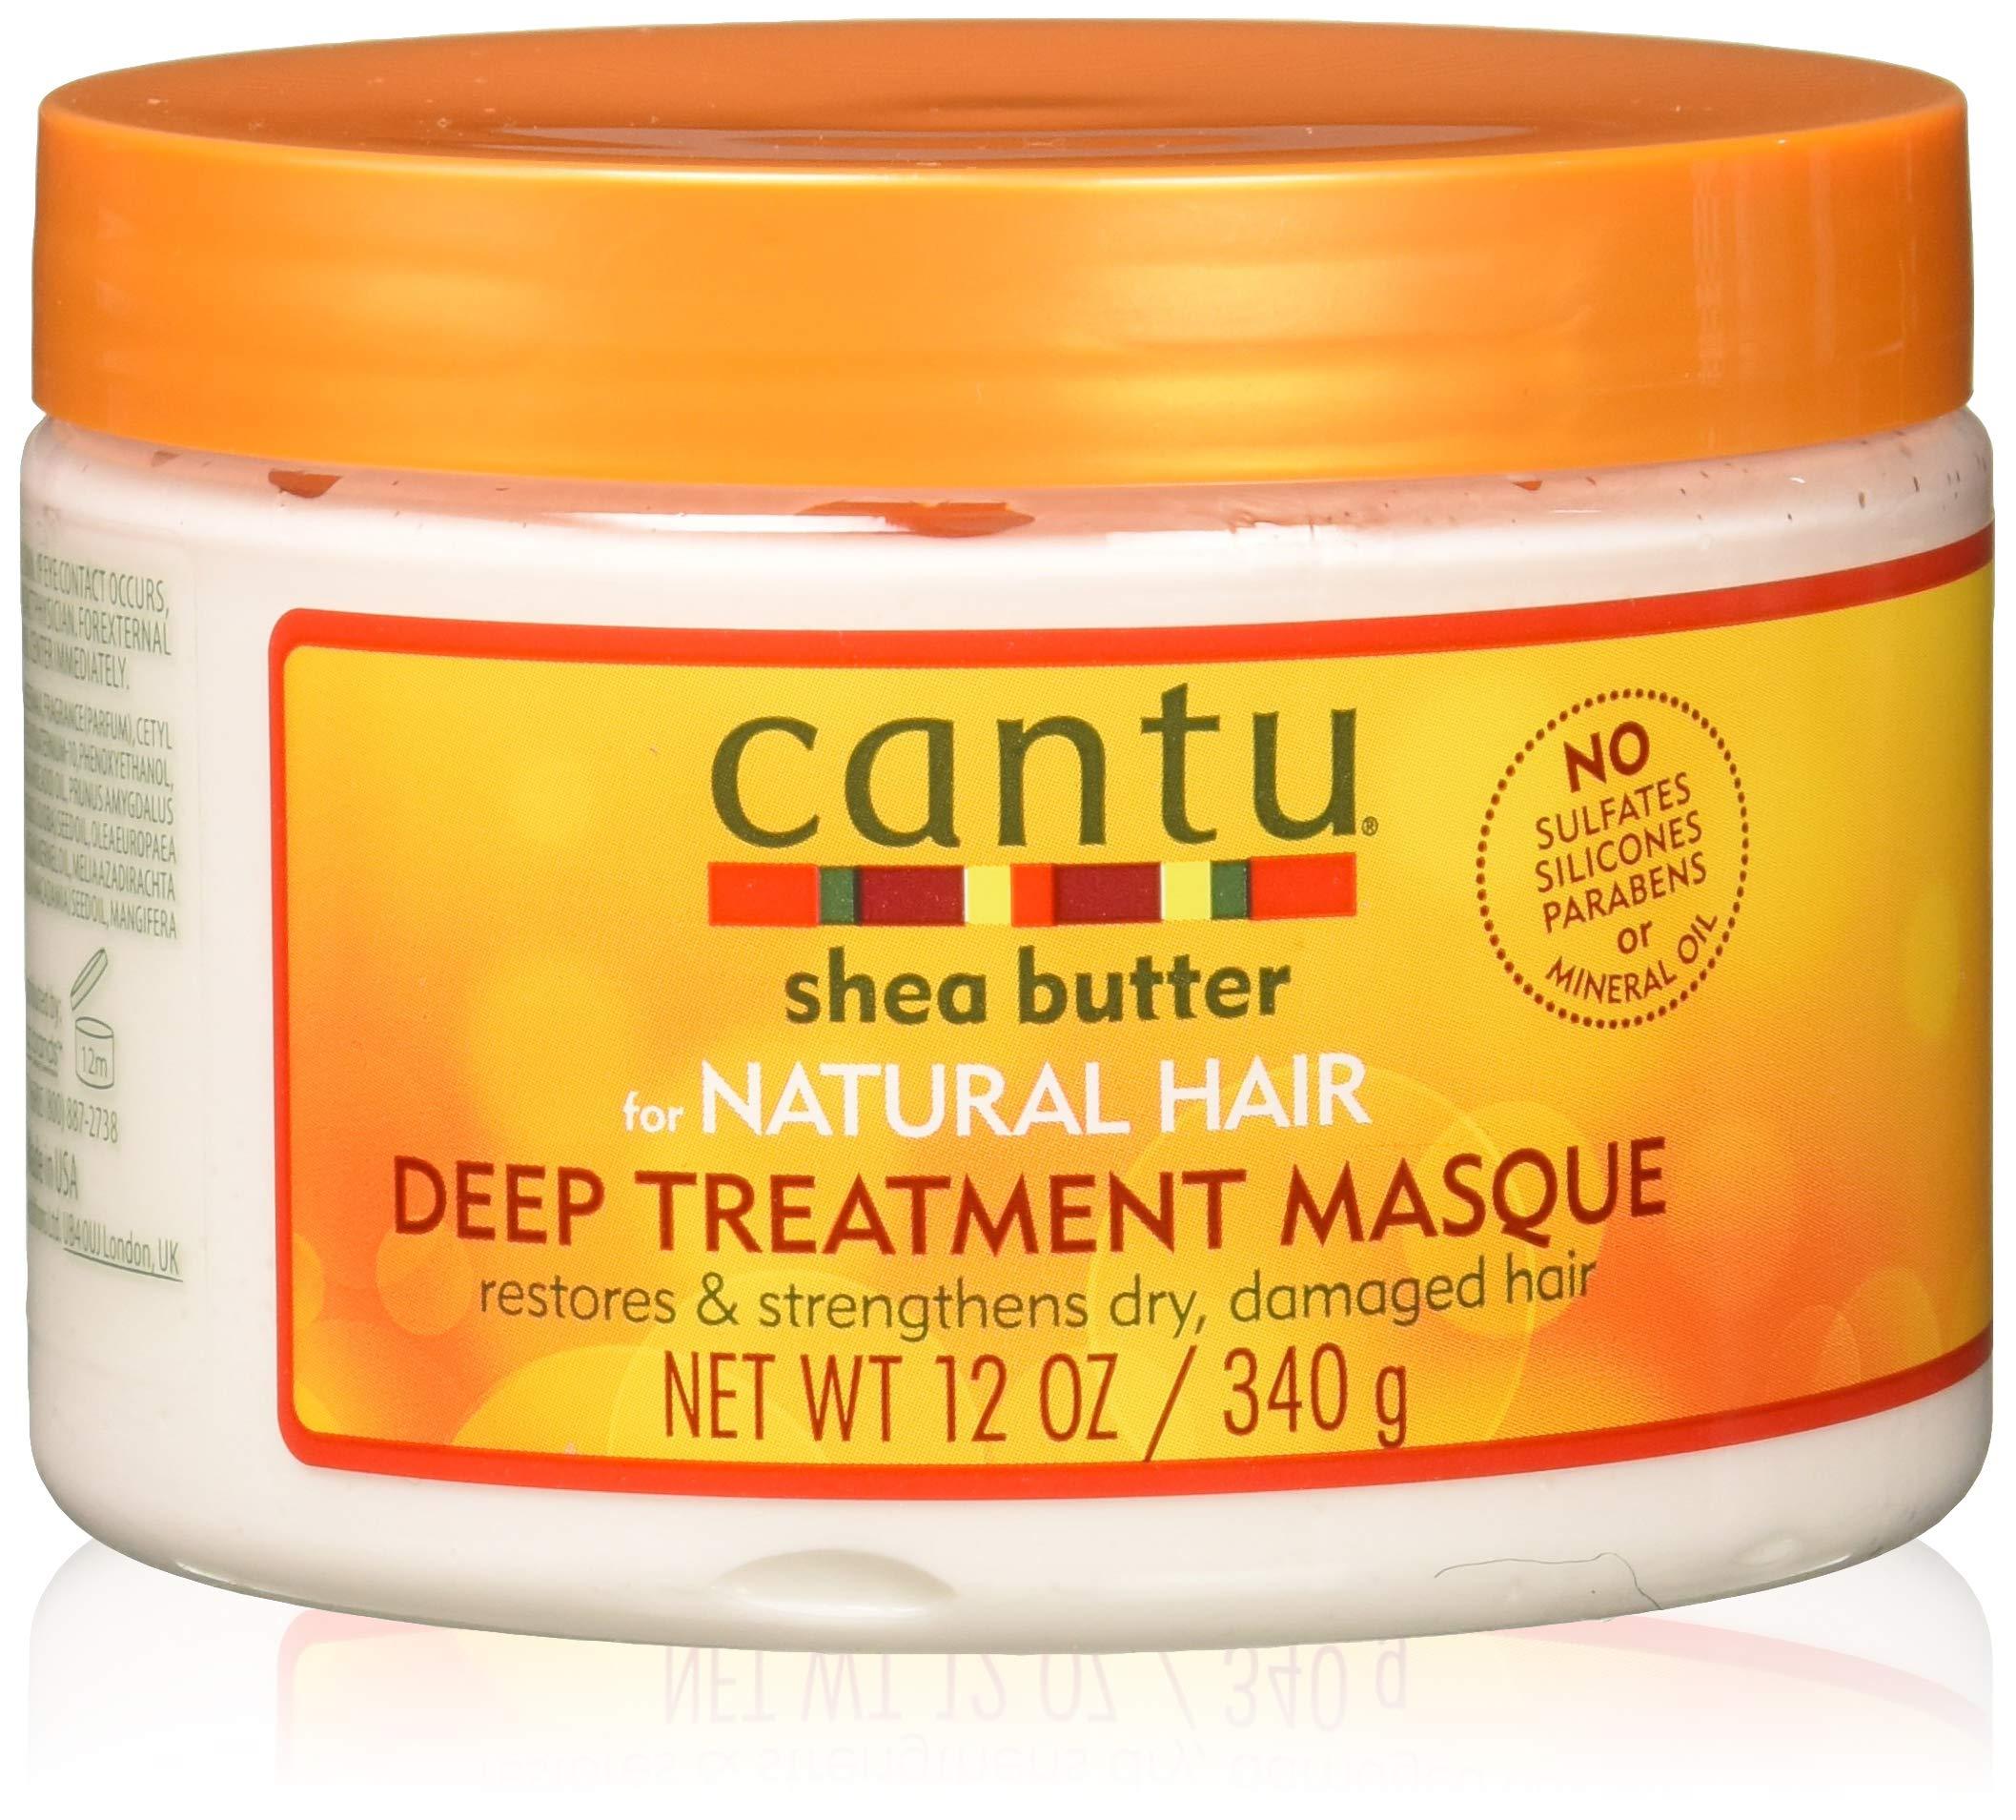 Cantu Shea Butter Deep Treatment Masque, 12 Ounce